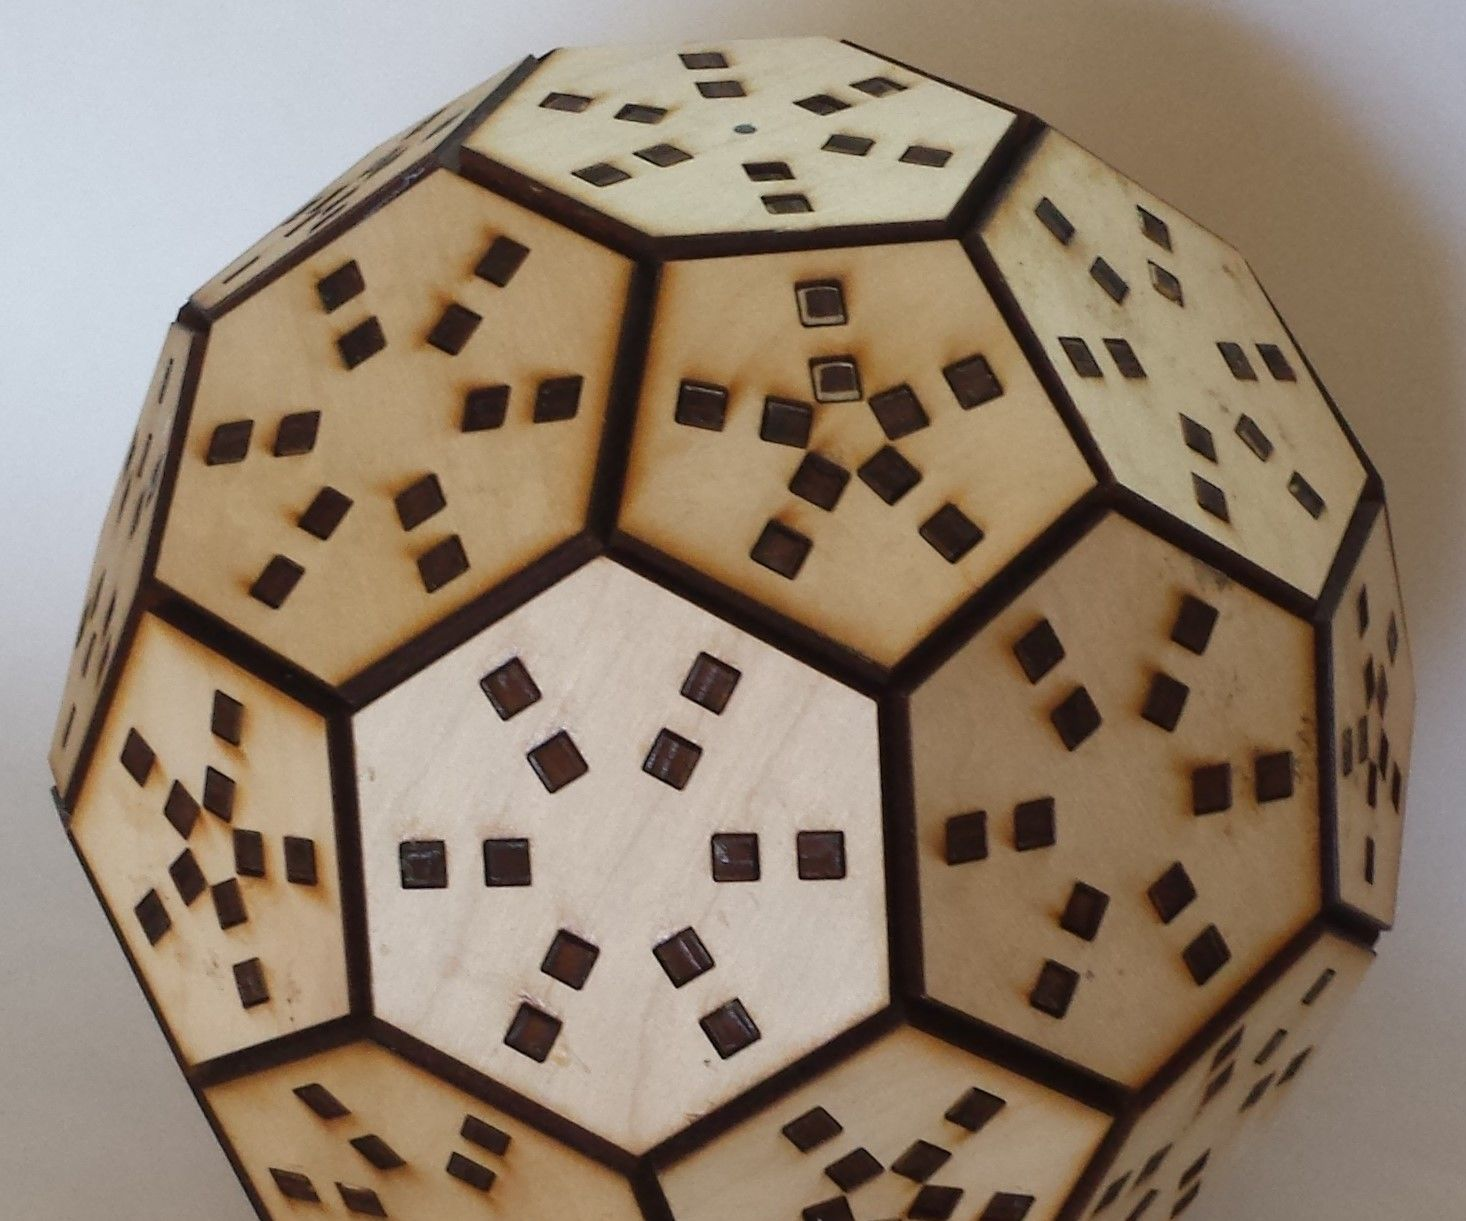 Wooden Truncated Icosahedron Puzzle